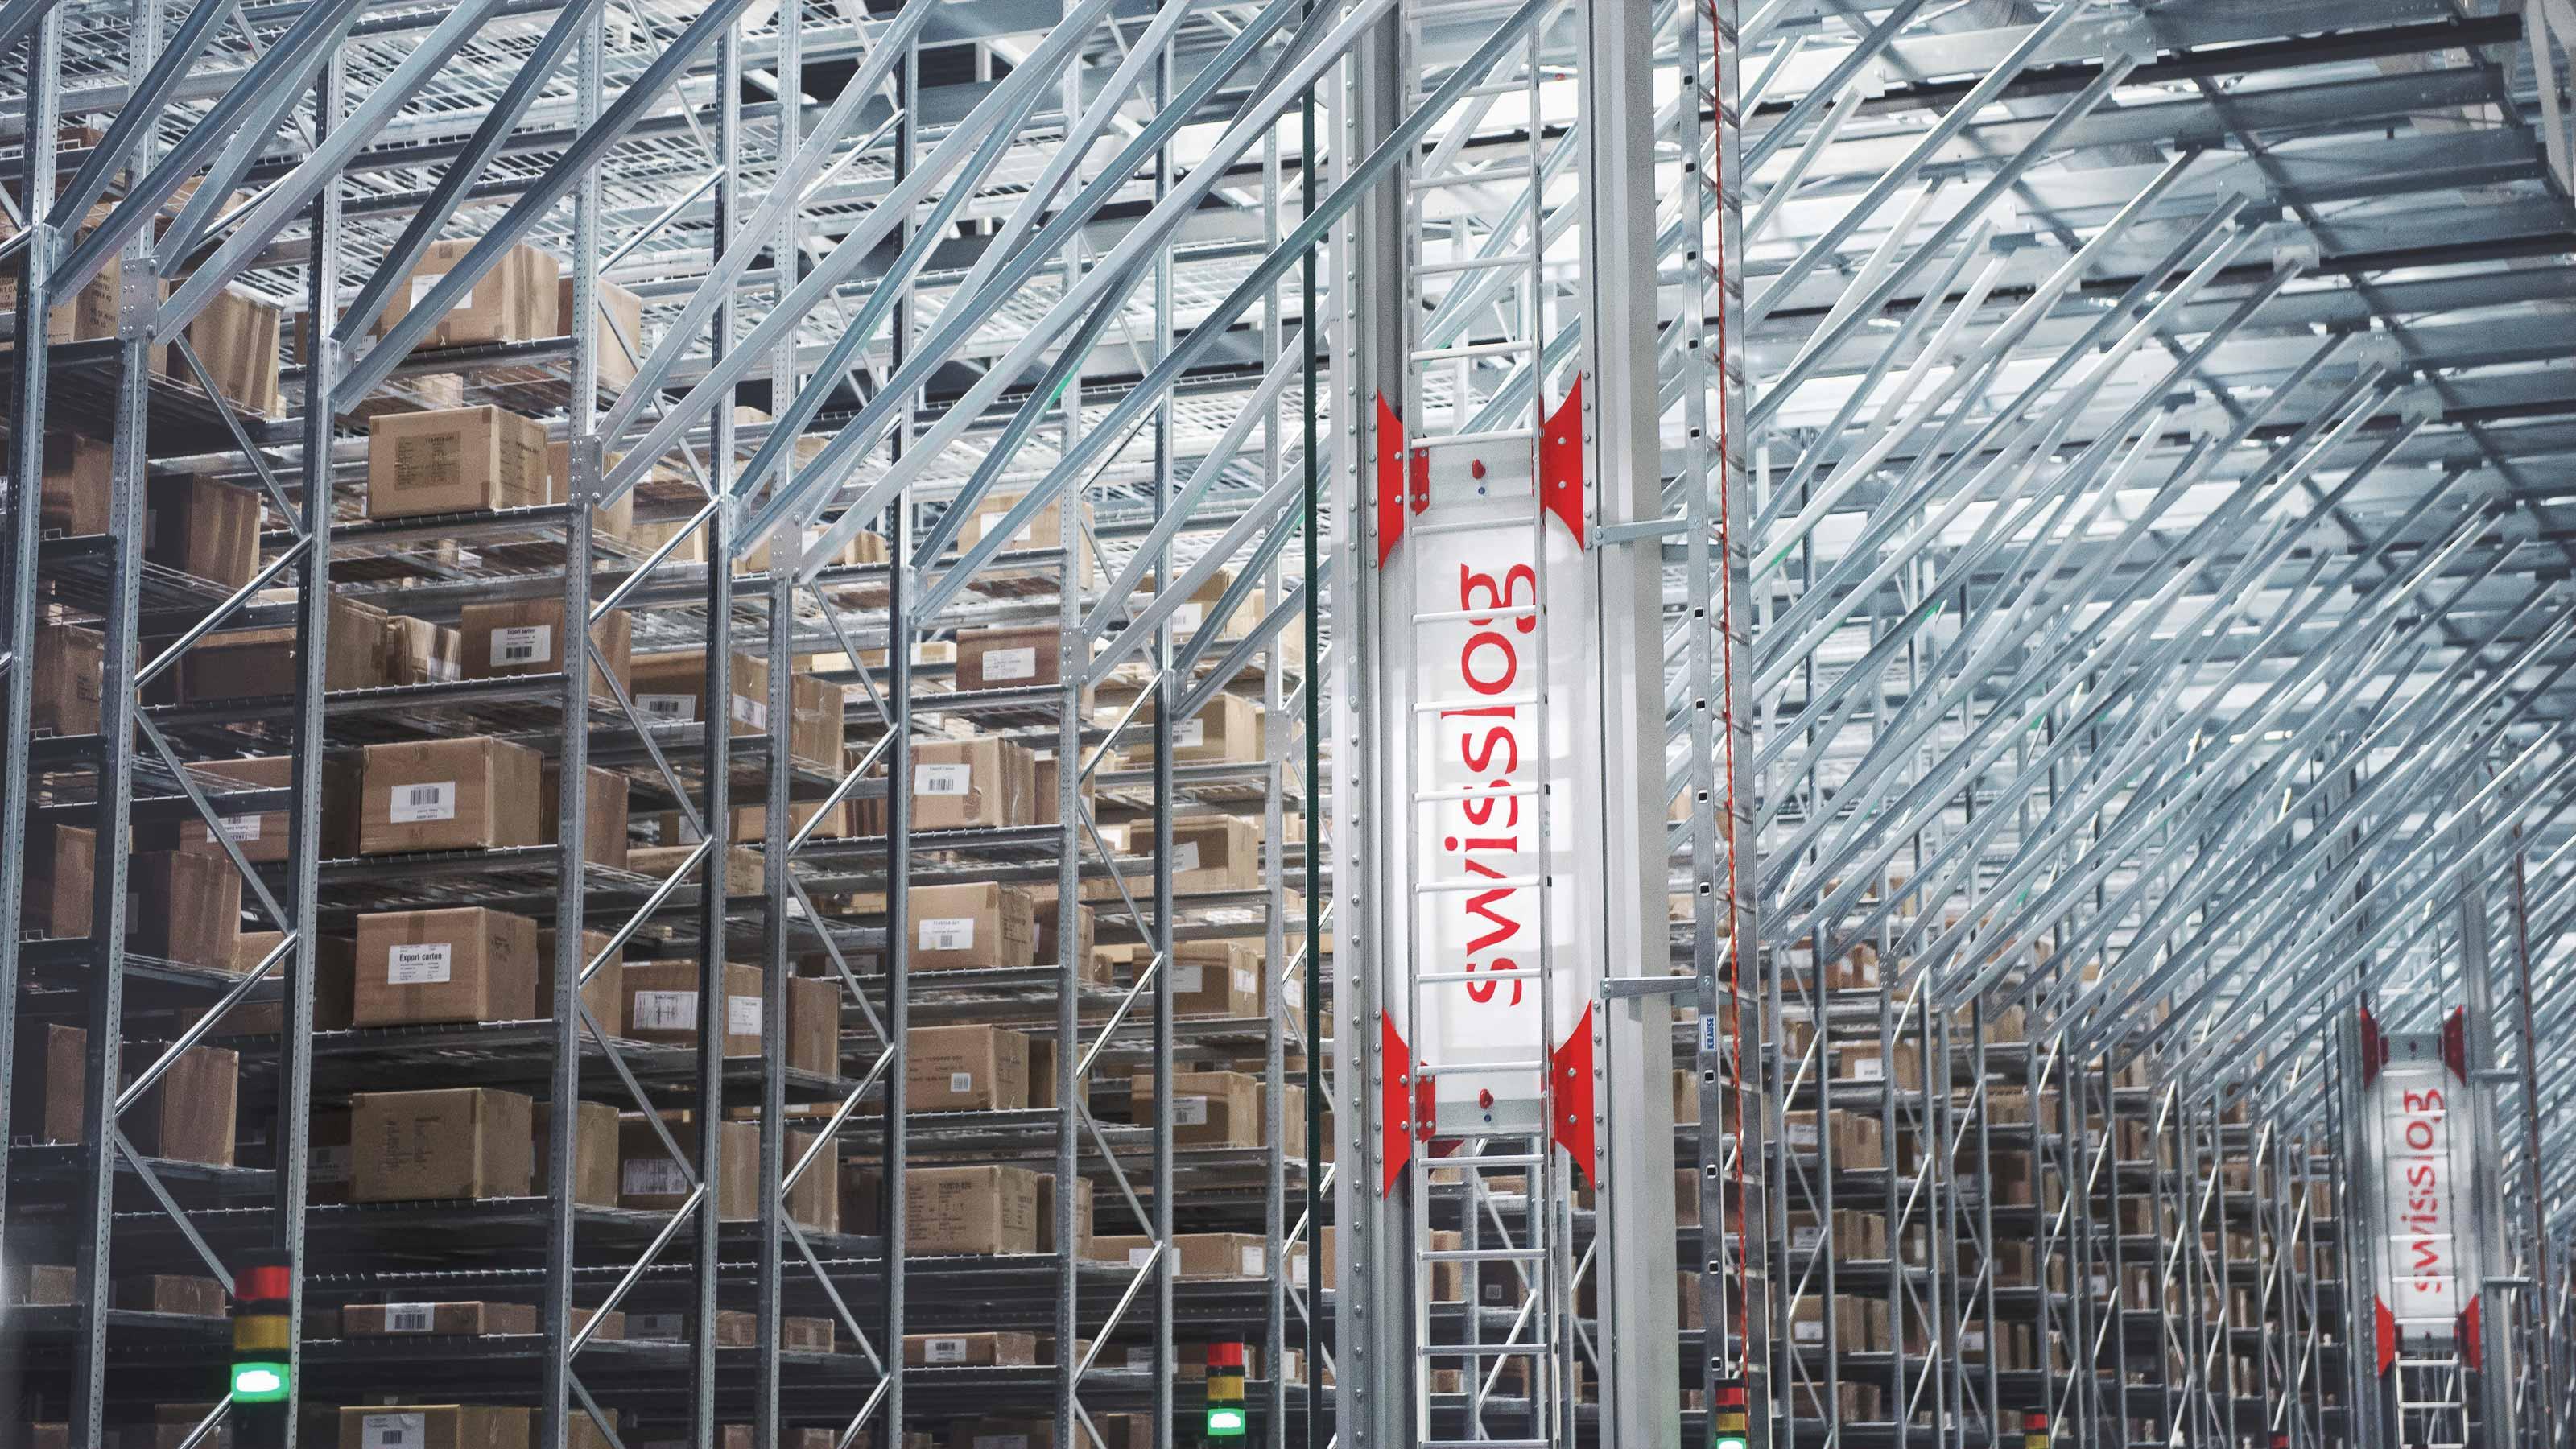 ASRS Automated Storage & Retrieval Systems | Swisslog